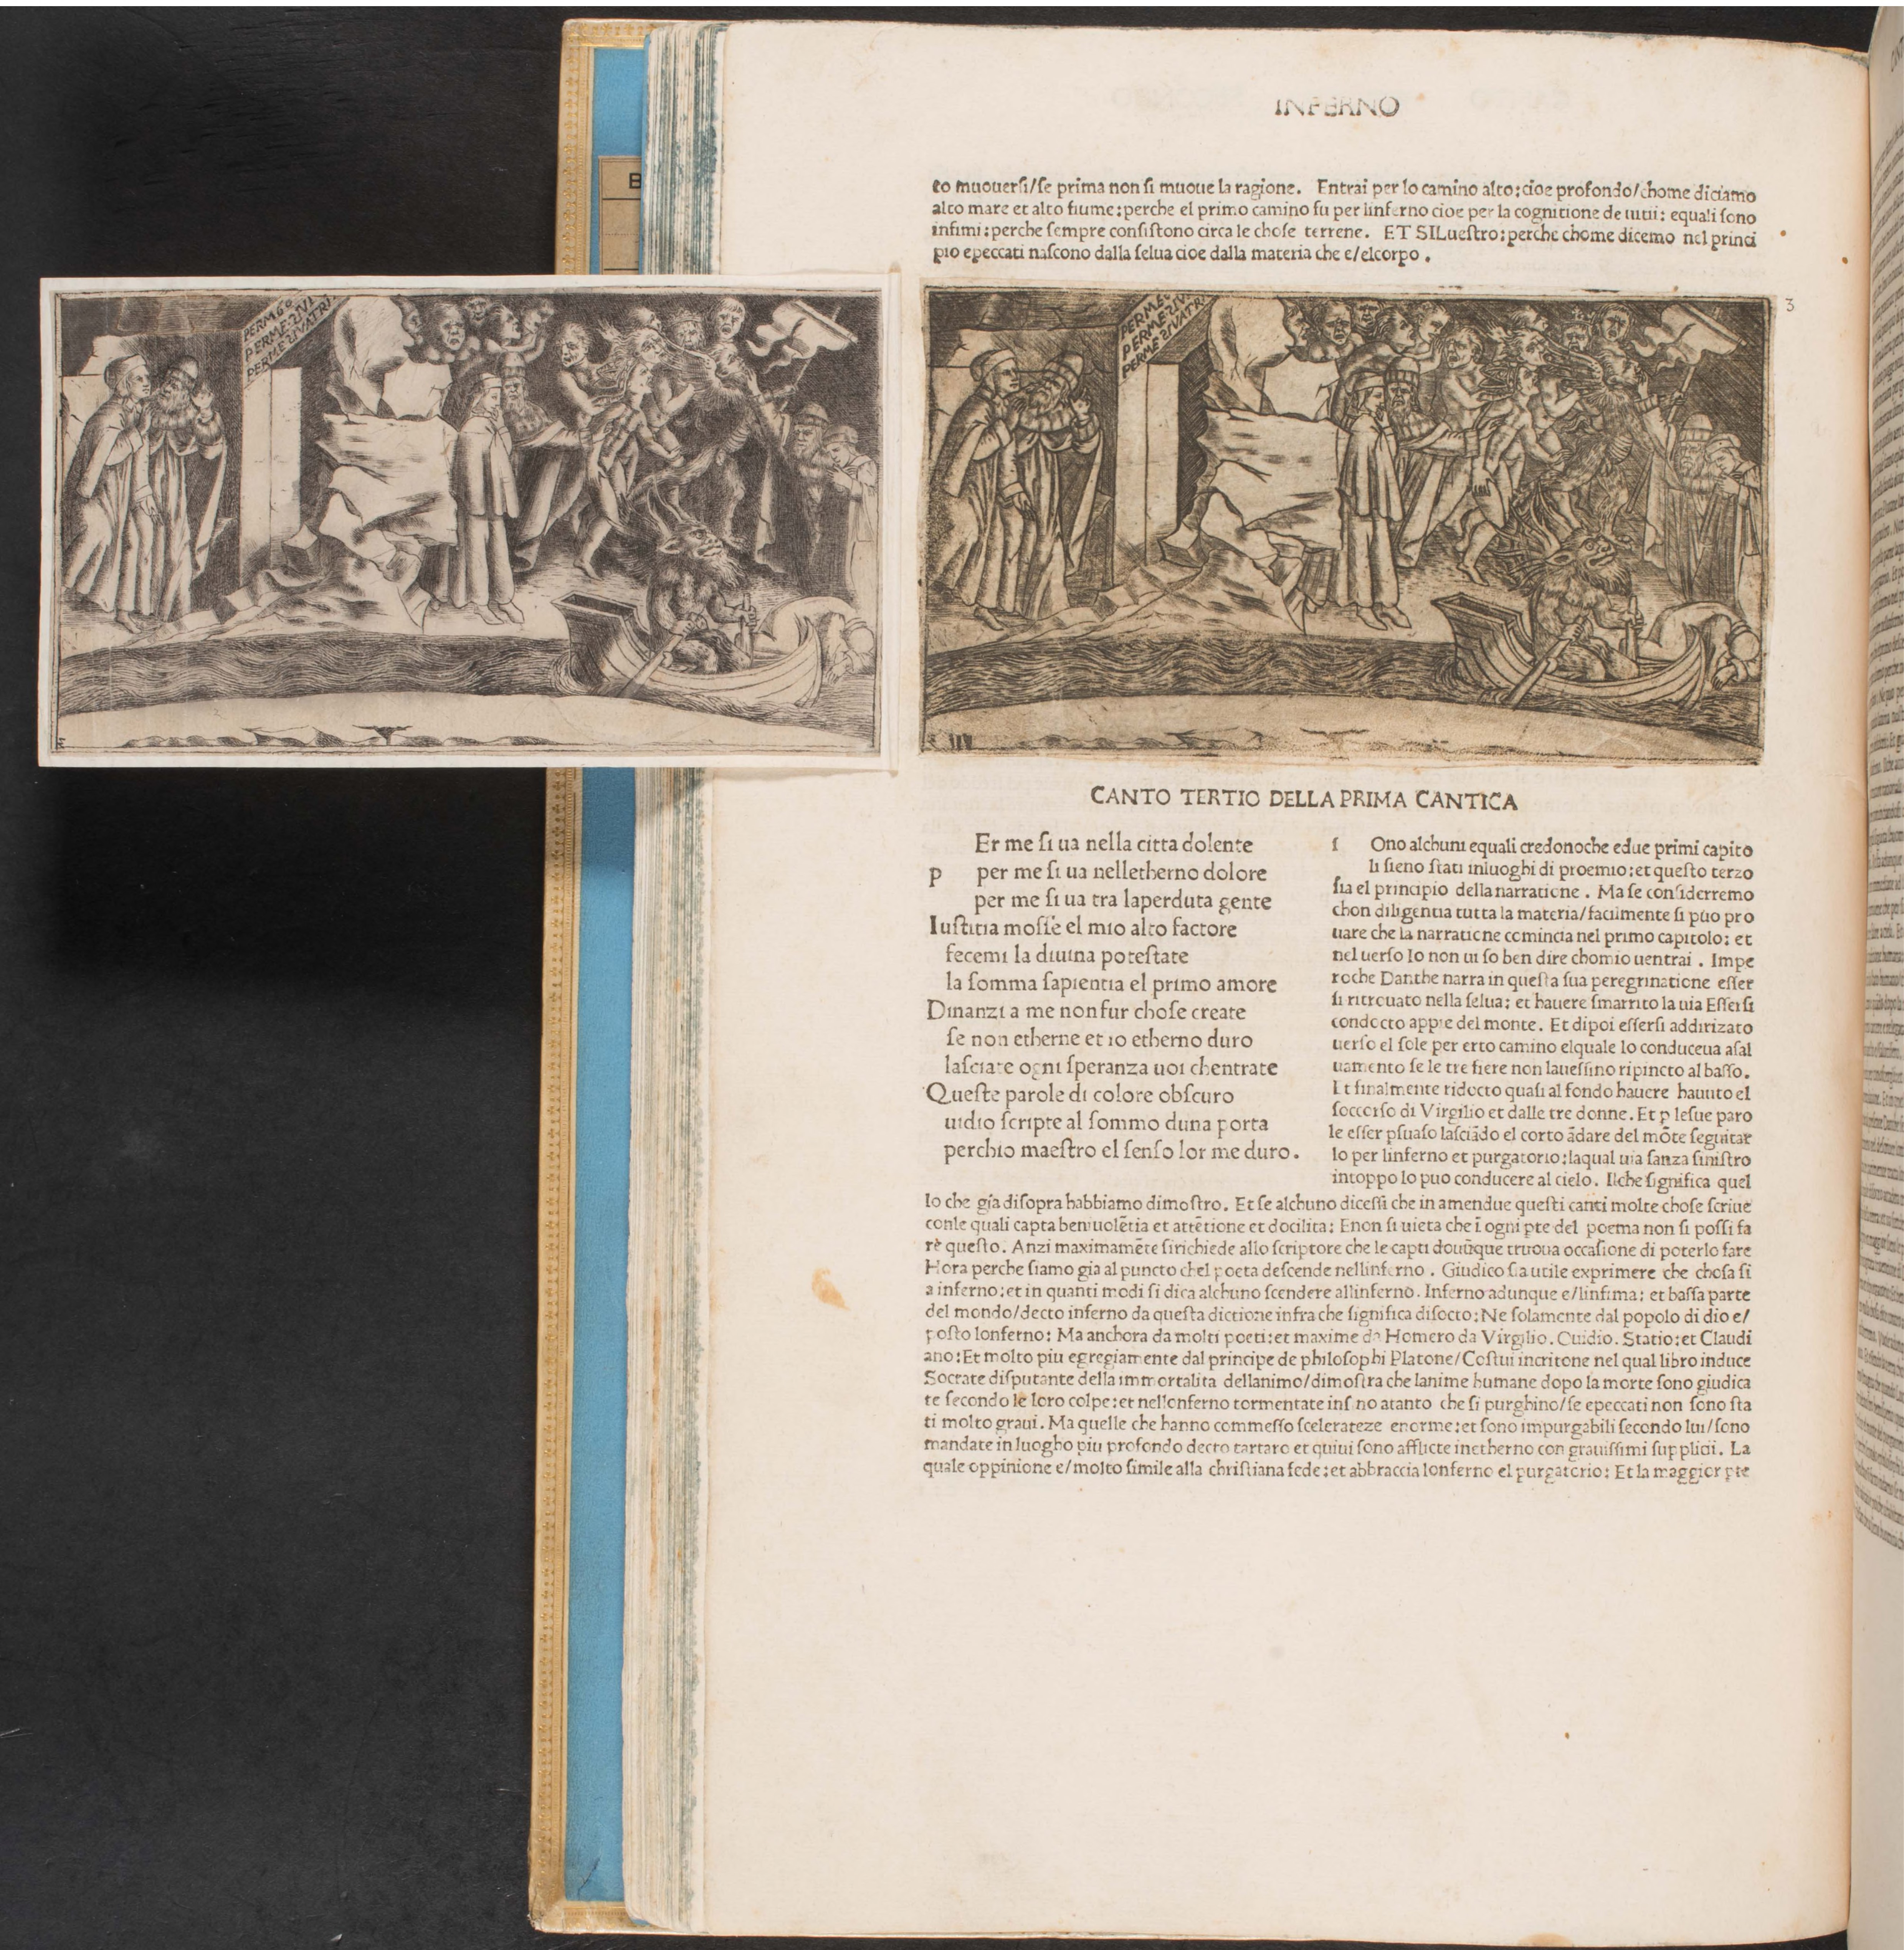 Firenze, Biblioteca Nazionale Centrale: Banco Rari 12. A kép forrása: Internet Archive https://archive.org/details/b.-r.-12_202101/page/n69/mode/1up